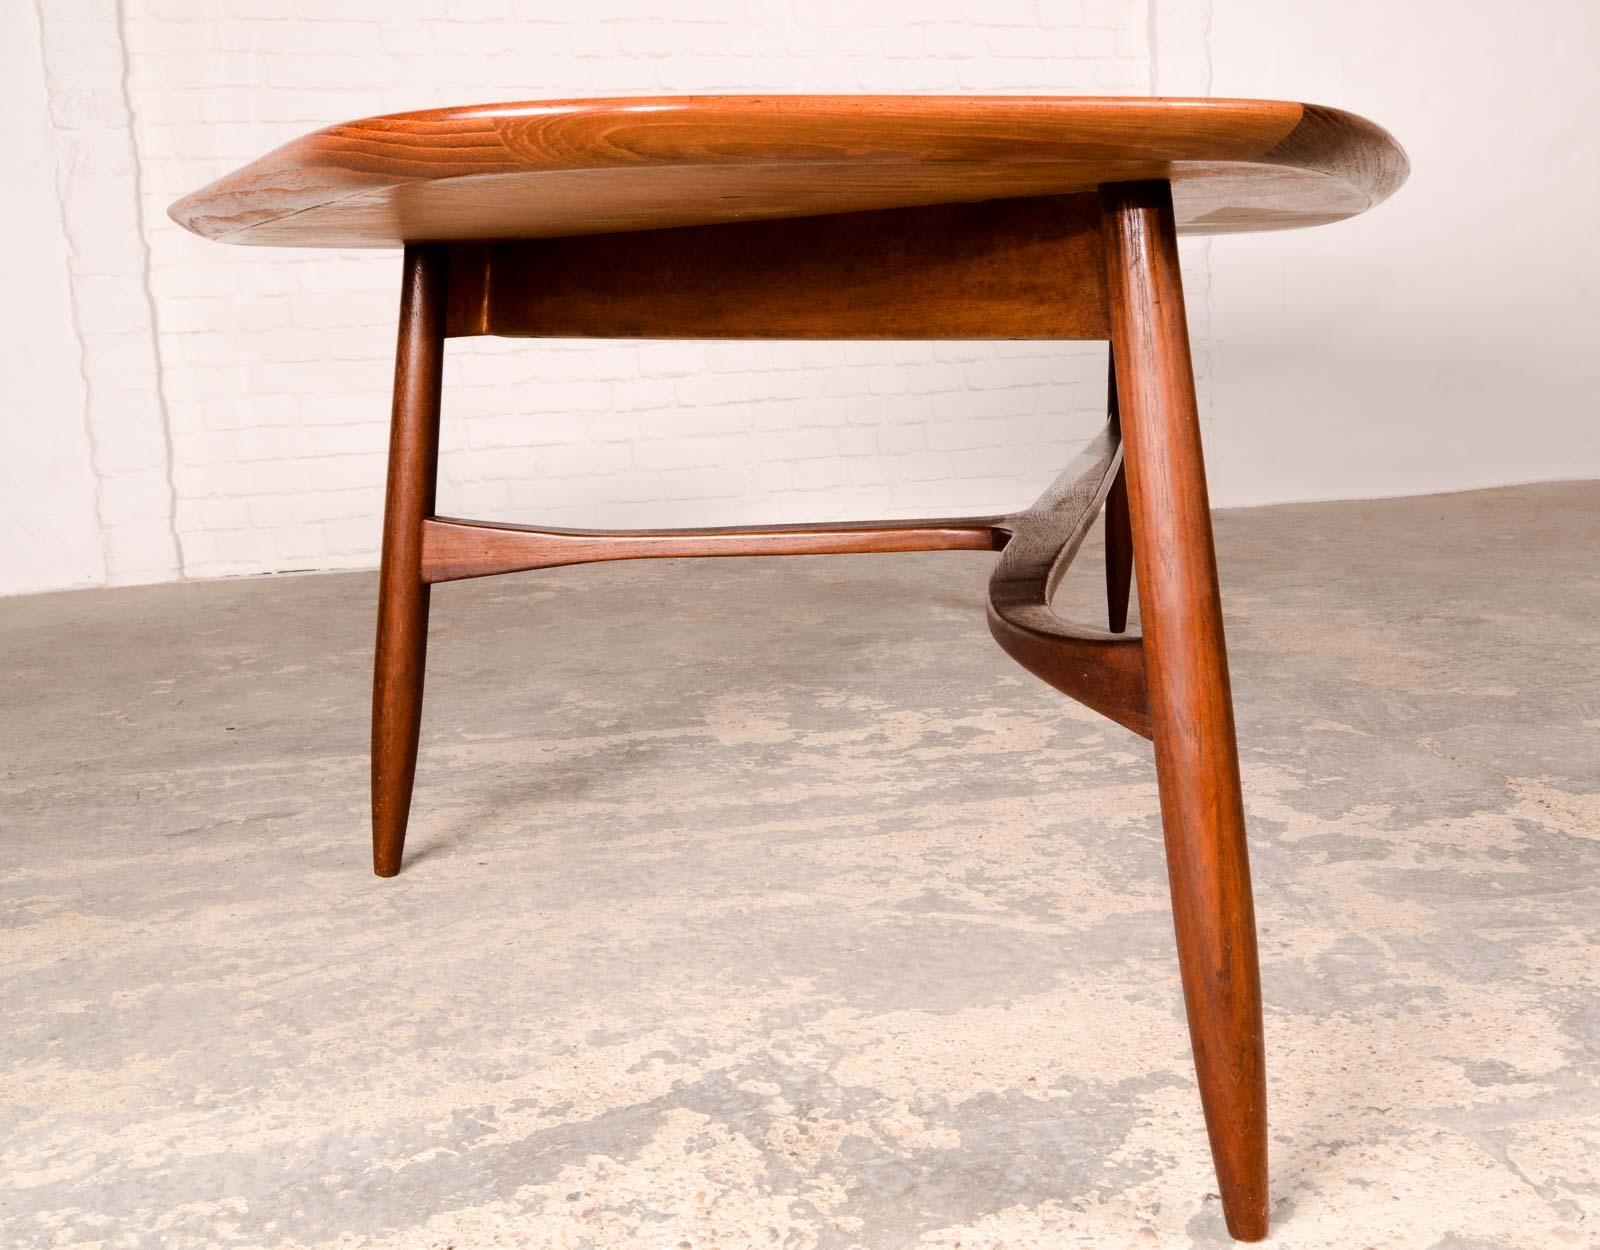 Free Form Shaped Kidney Coffee Table designed by Svante Skogh